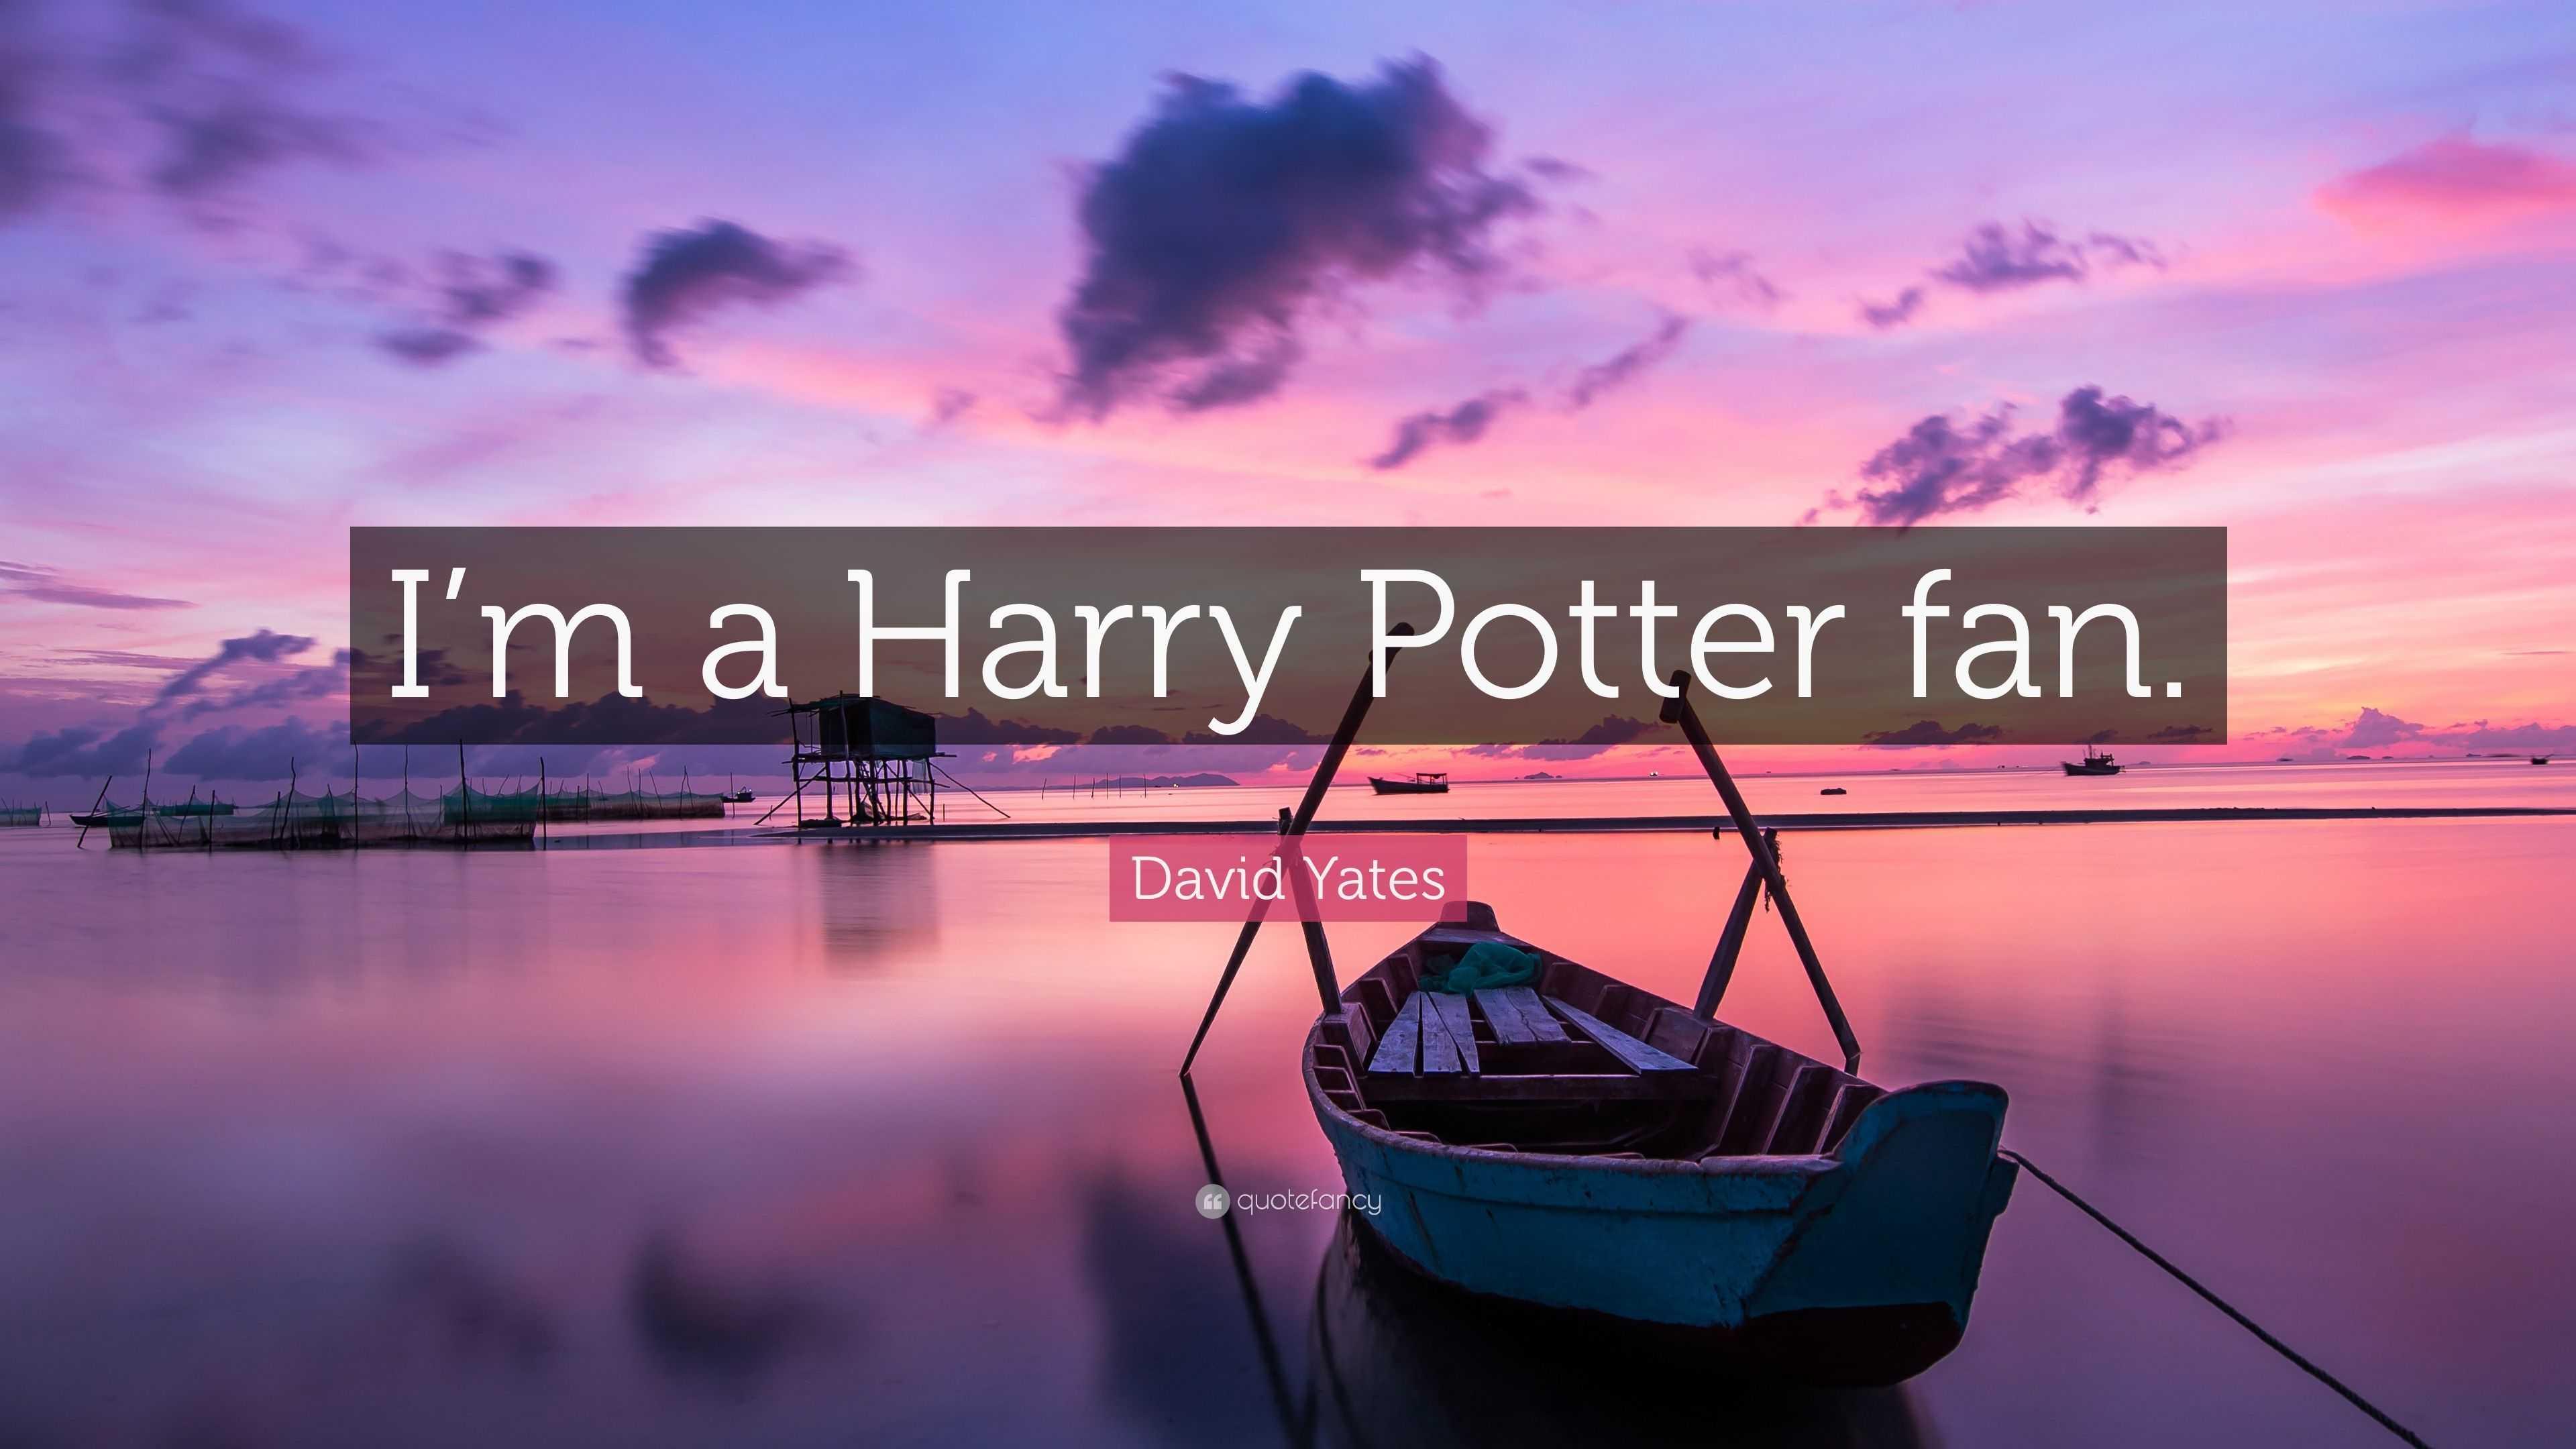 Best Wallpaper Harry Potter Purple - 5062684-David-Yates-Quote-I-m-a-Harry-Potter-fan  Graphic_444064.jpg